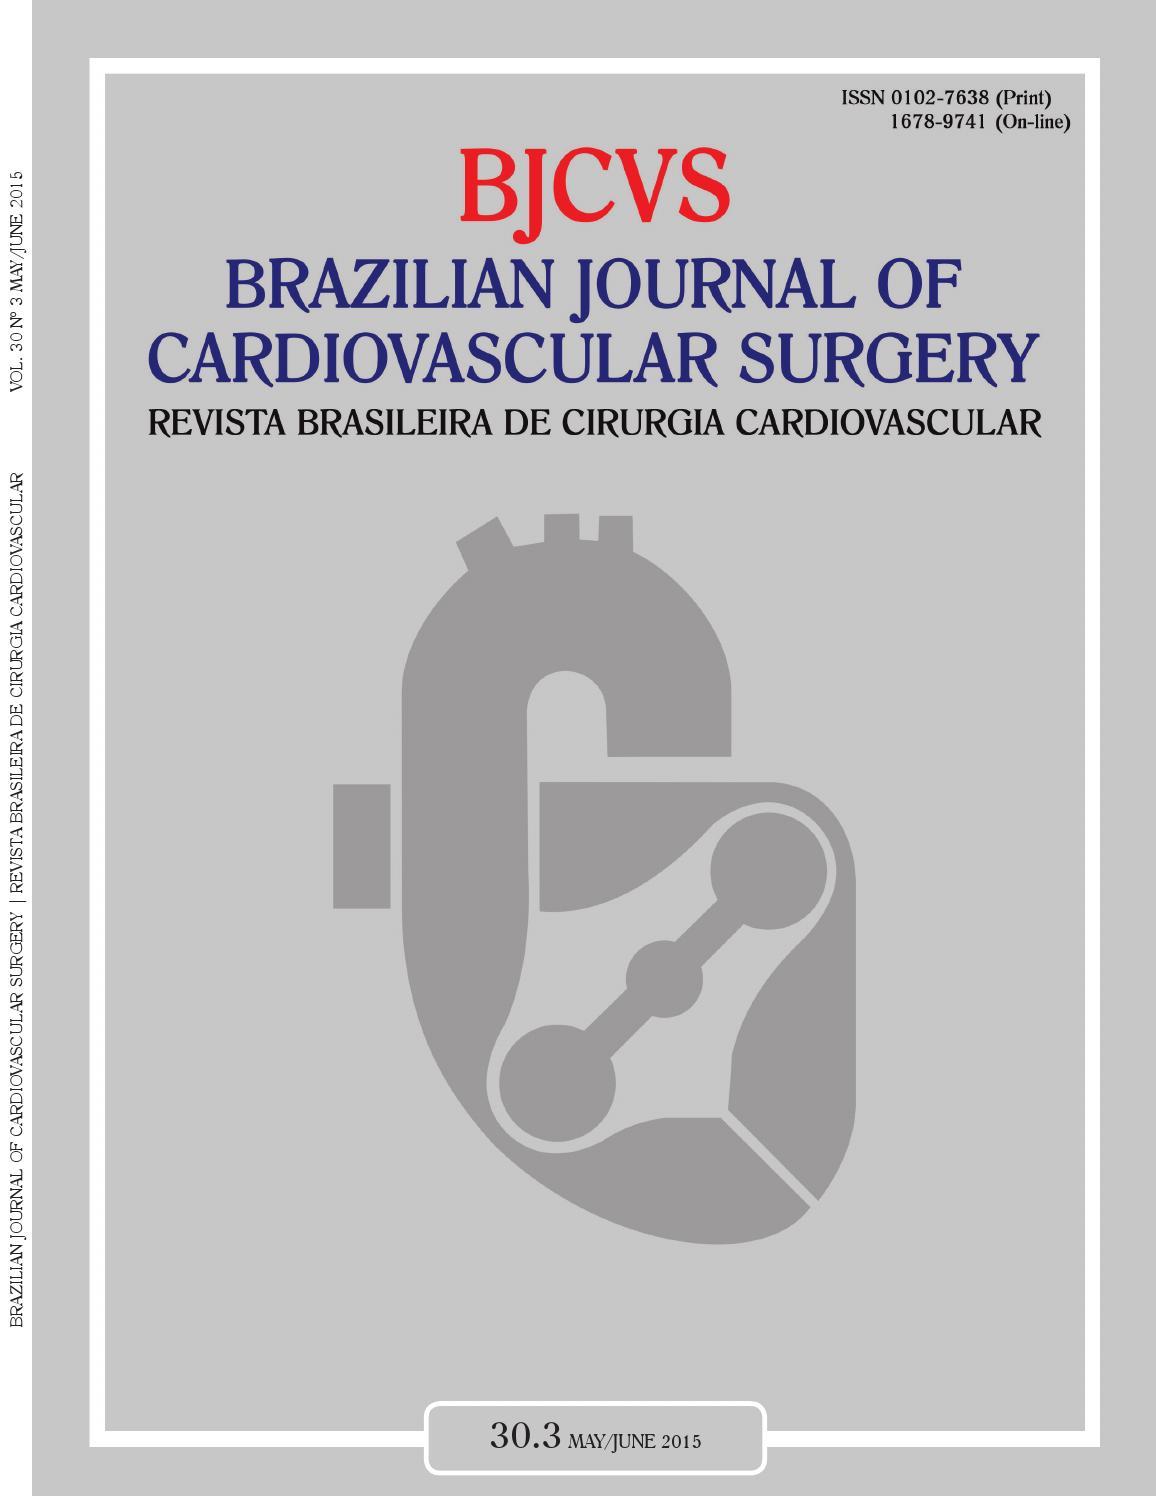 Brazilian Journal of Cardiovascular Surgery 30.3 by Revista Brasileira de  Cirurgia Cardiovascular - issuu c85649fb96b